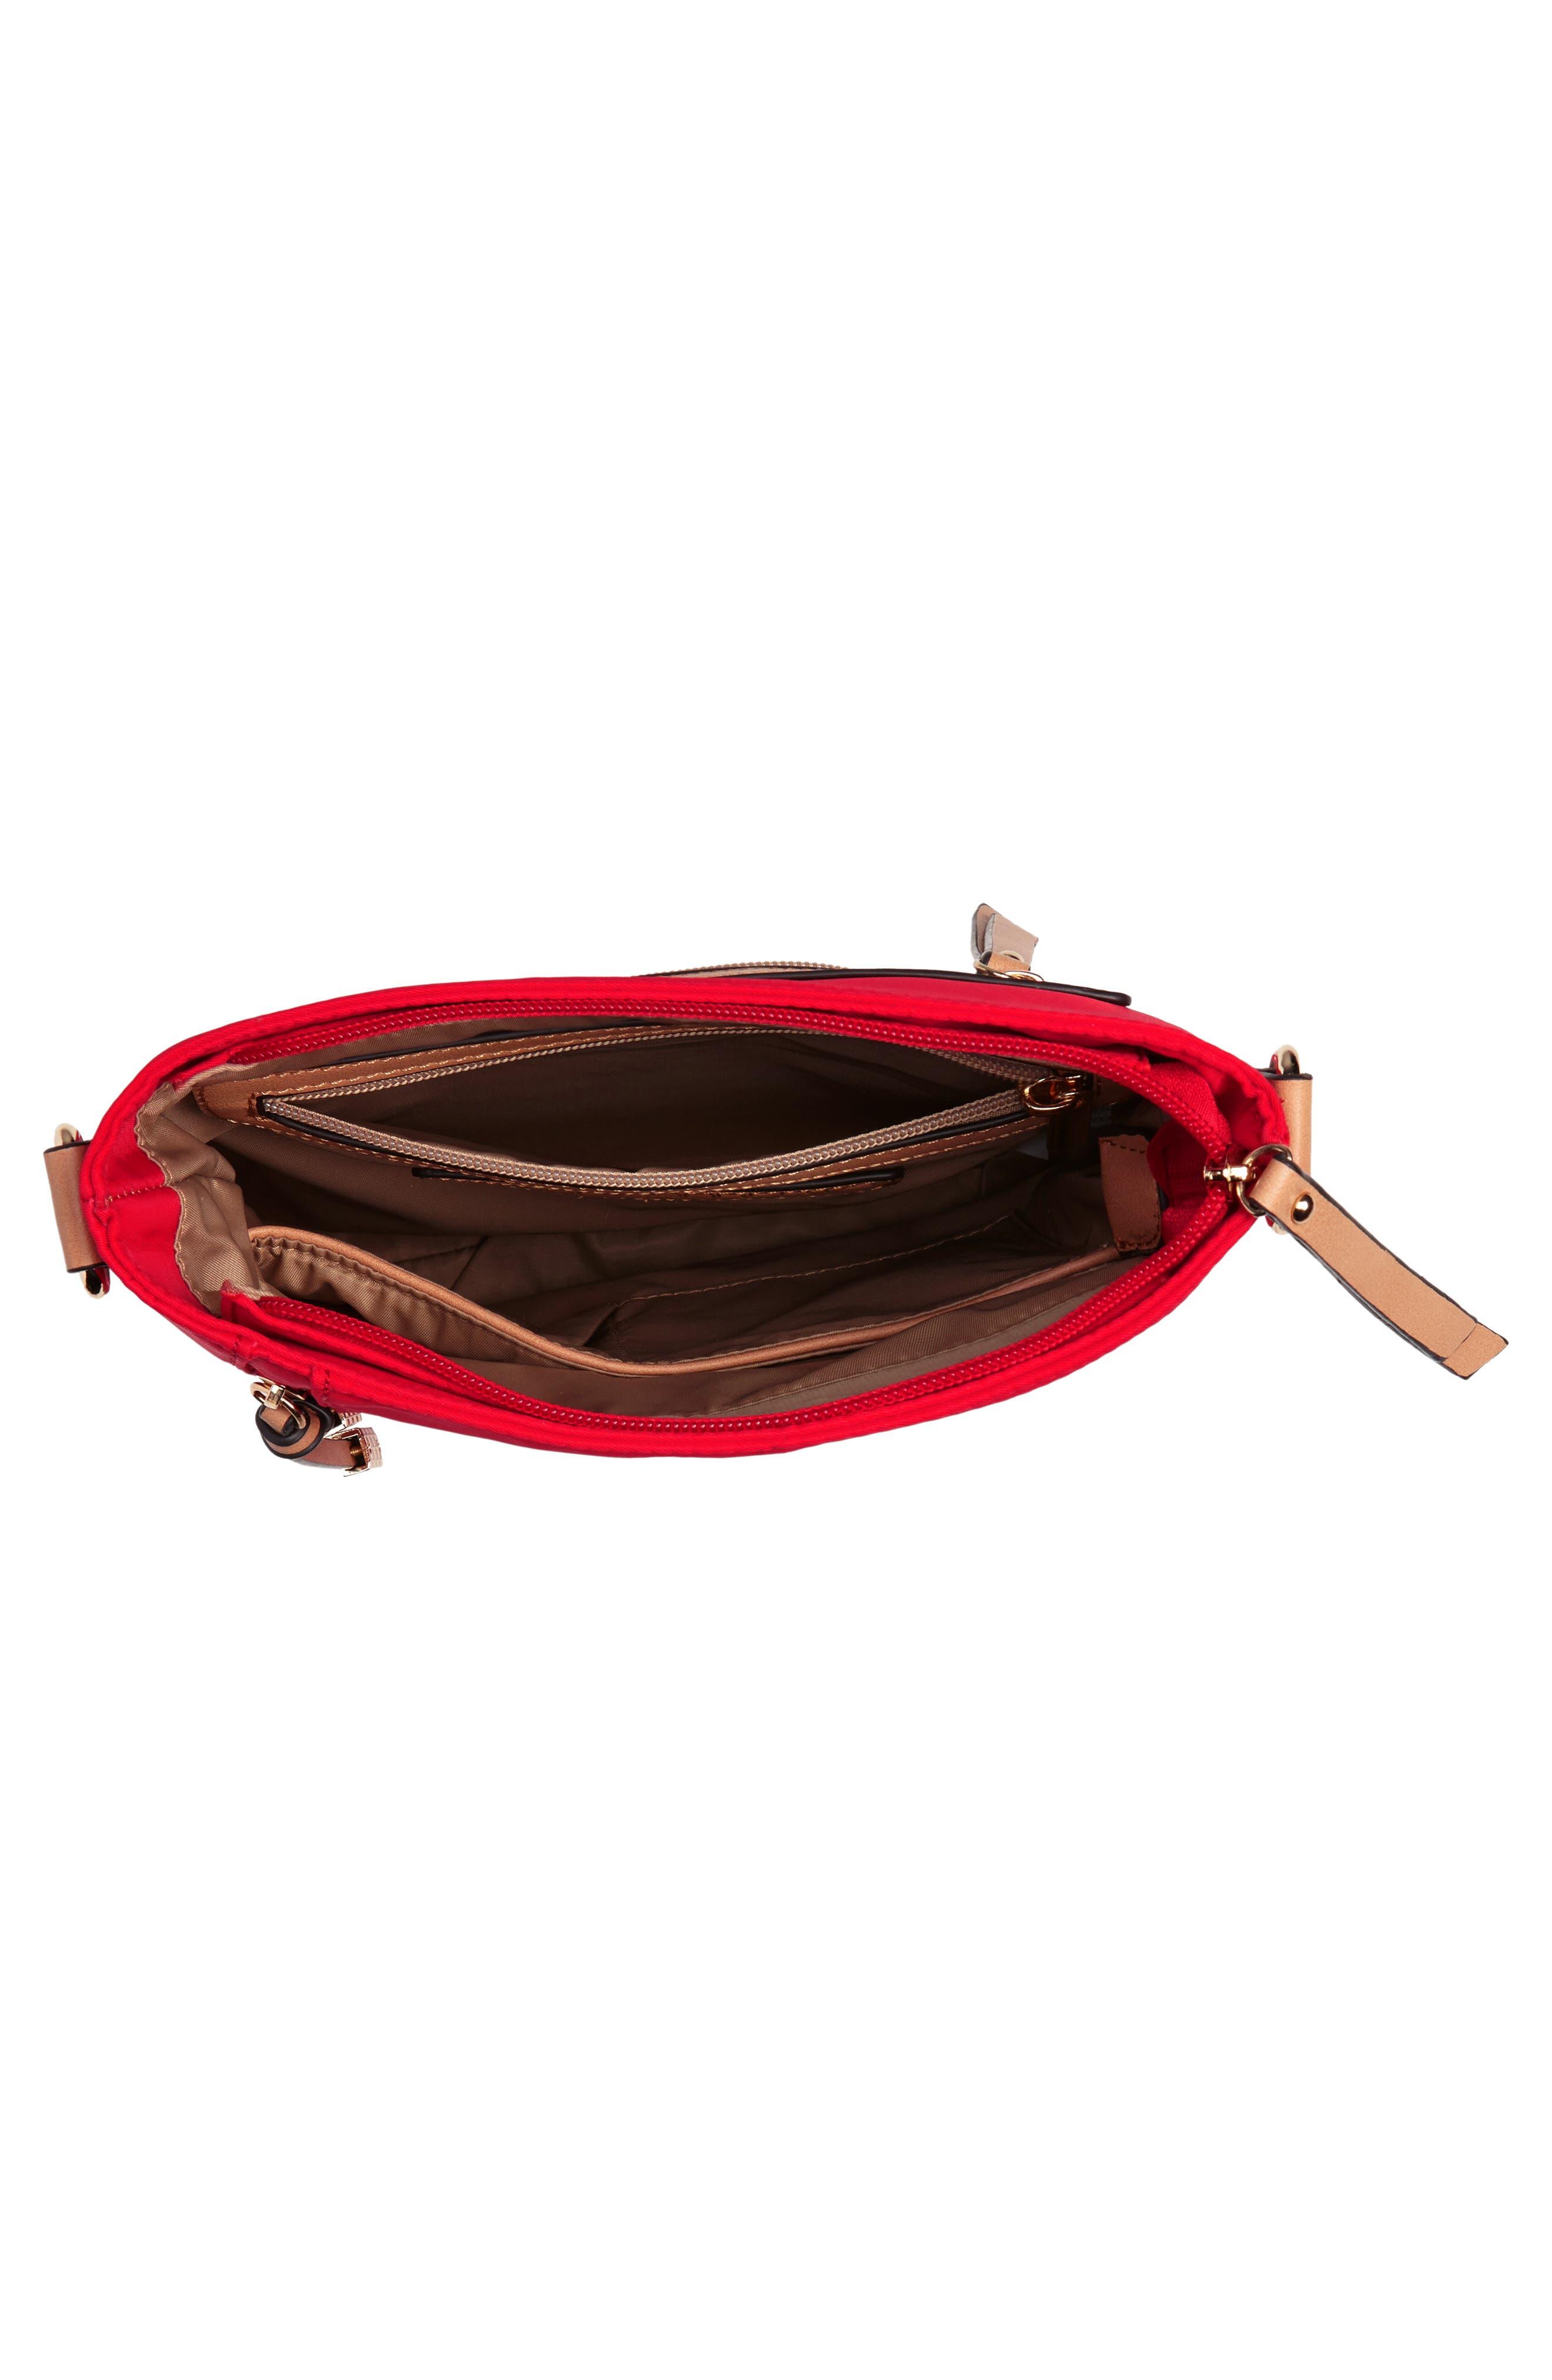 Guitar Strap Crossbody Bag,                             Alternate thumbnail 4, color,                             Red